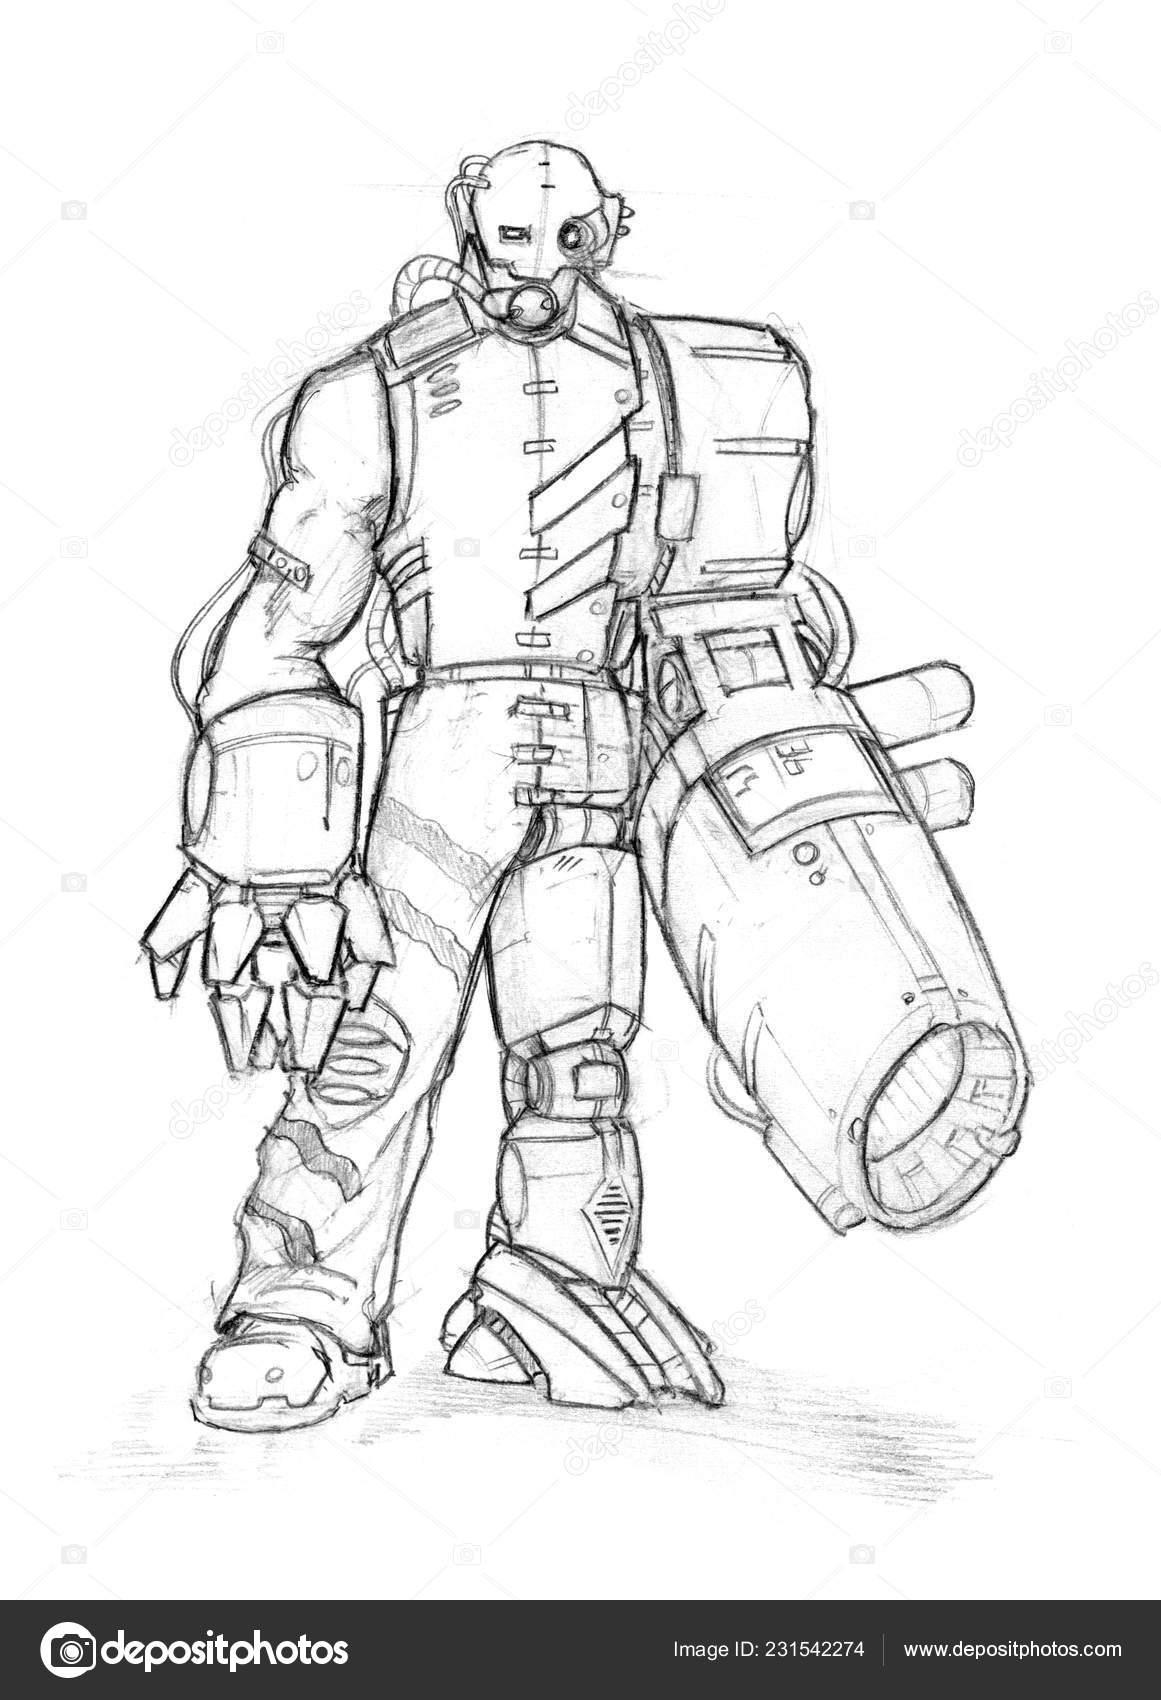 Grunge Negro Dibujo A Lápiz áspero De Cyborg Con Arma En Lugar De